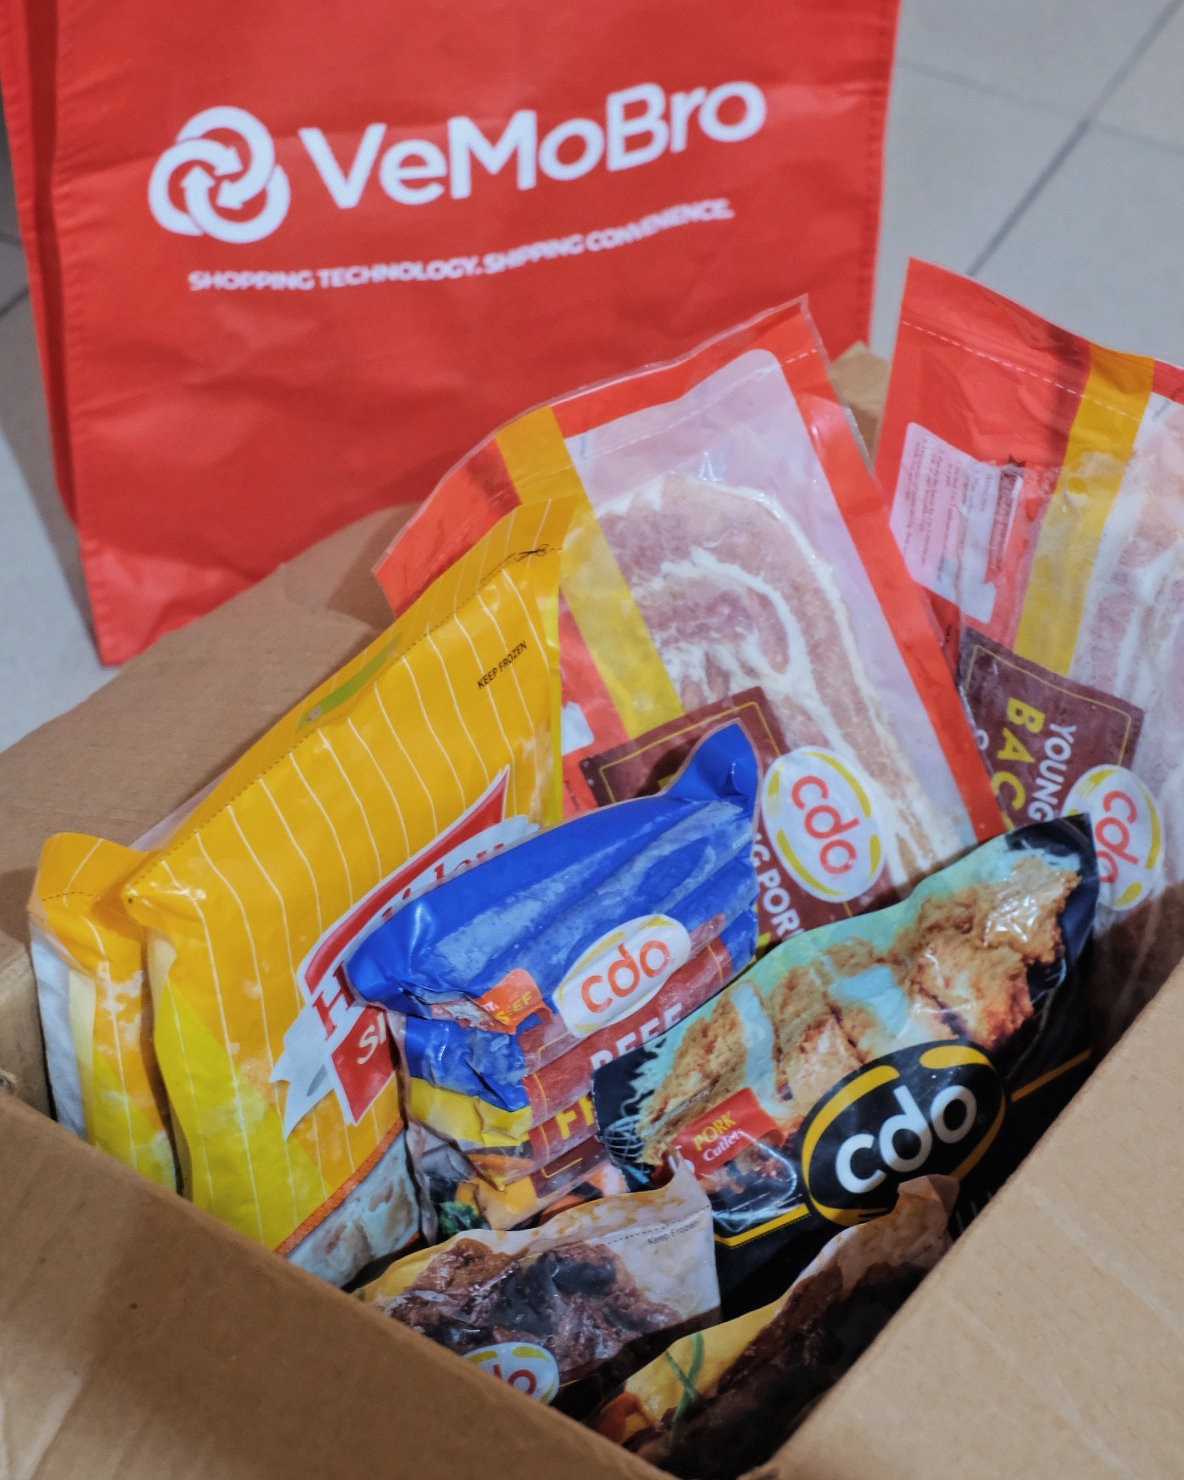 VeMoBro: New Online Shopping Platform + Review